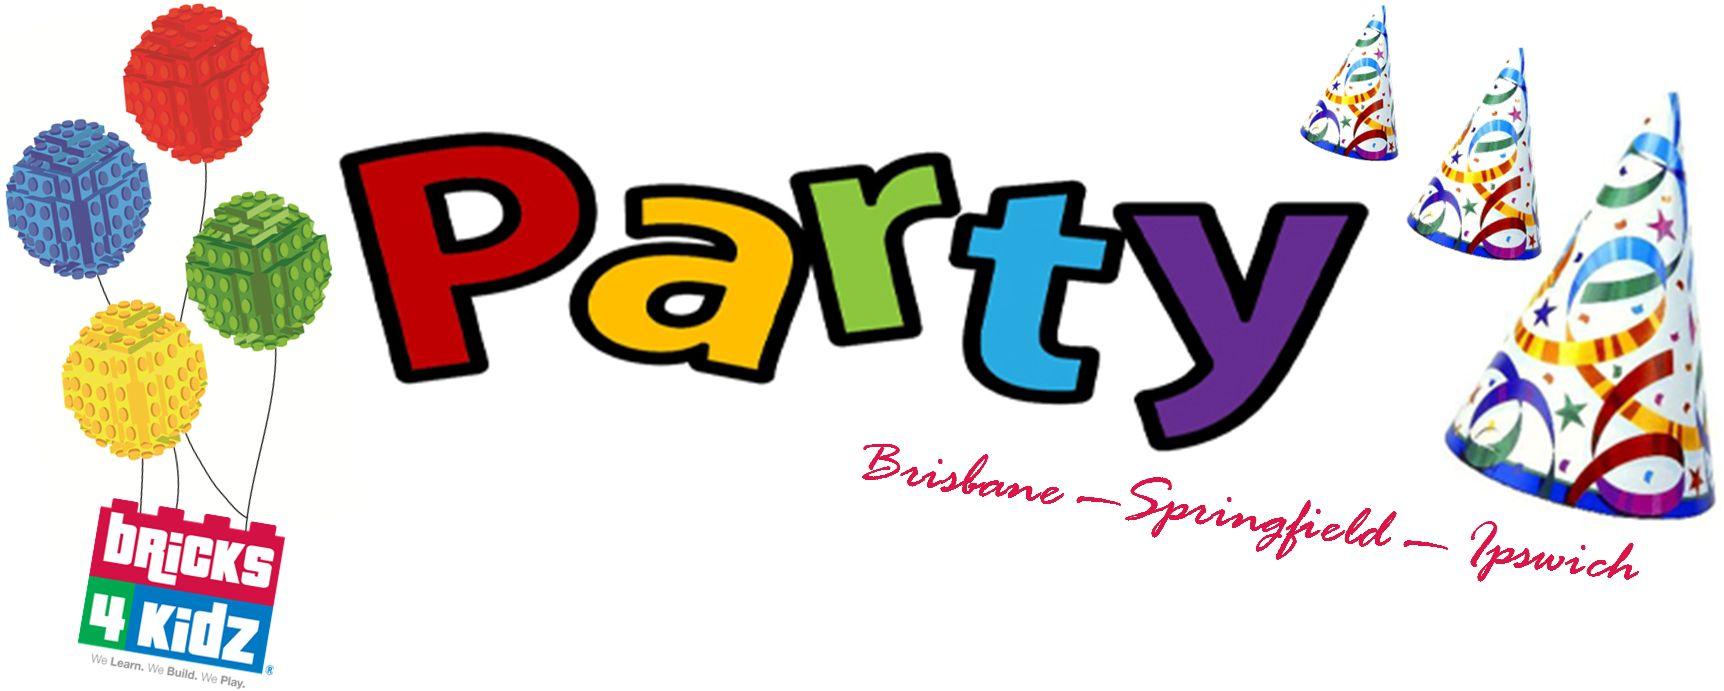 Kids Birthday Party Bricks 4 Kidz Centre Springfield Or